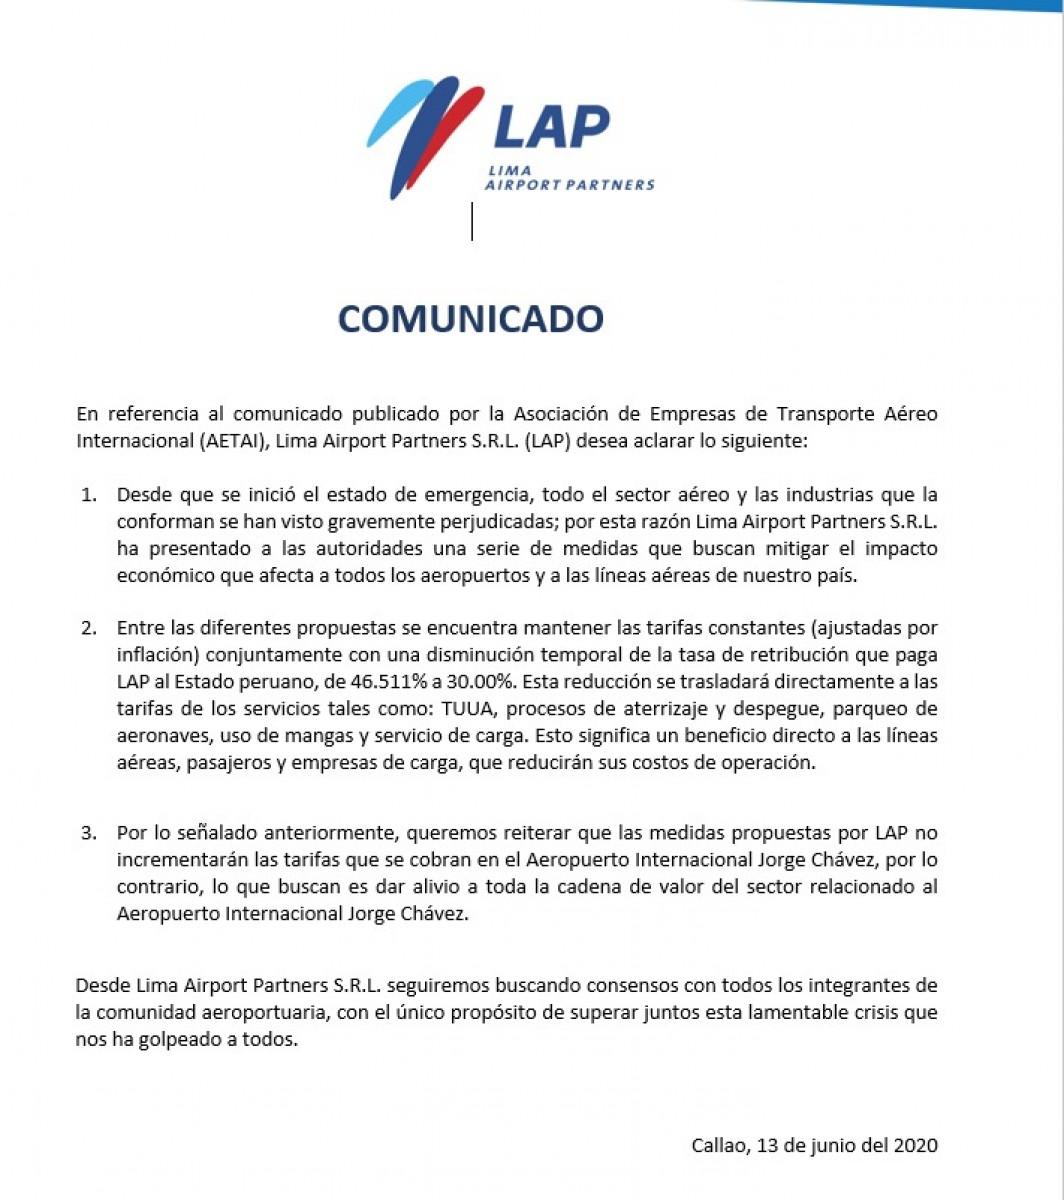 Comunicado de LAP